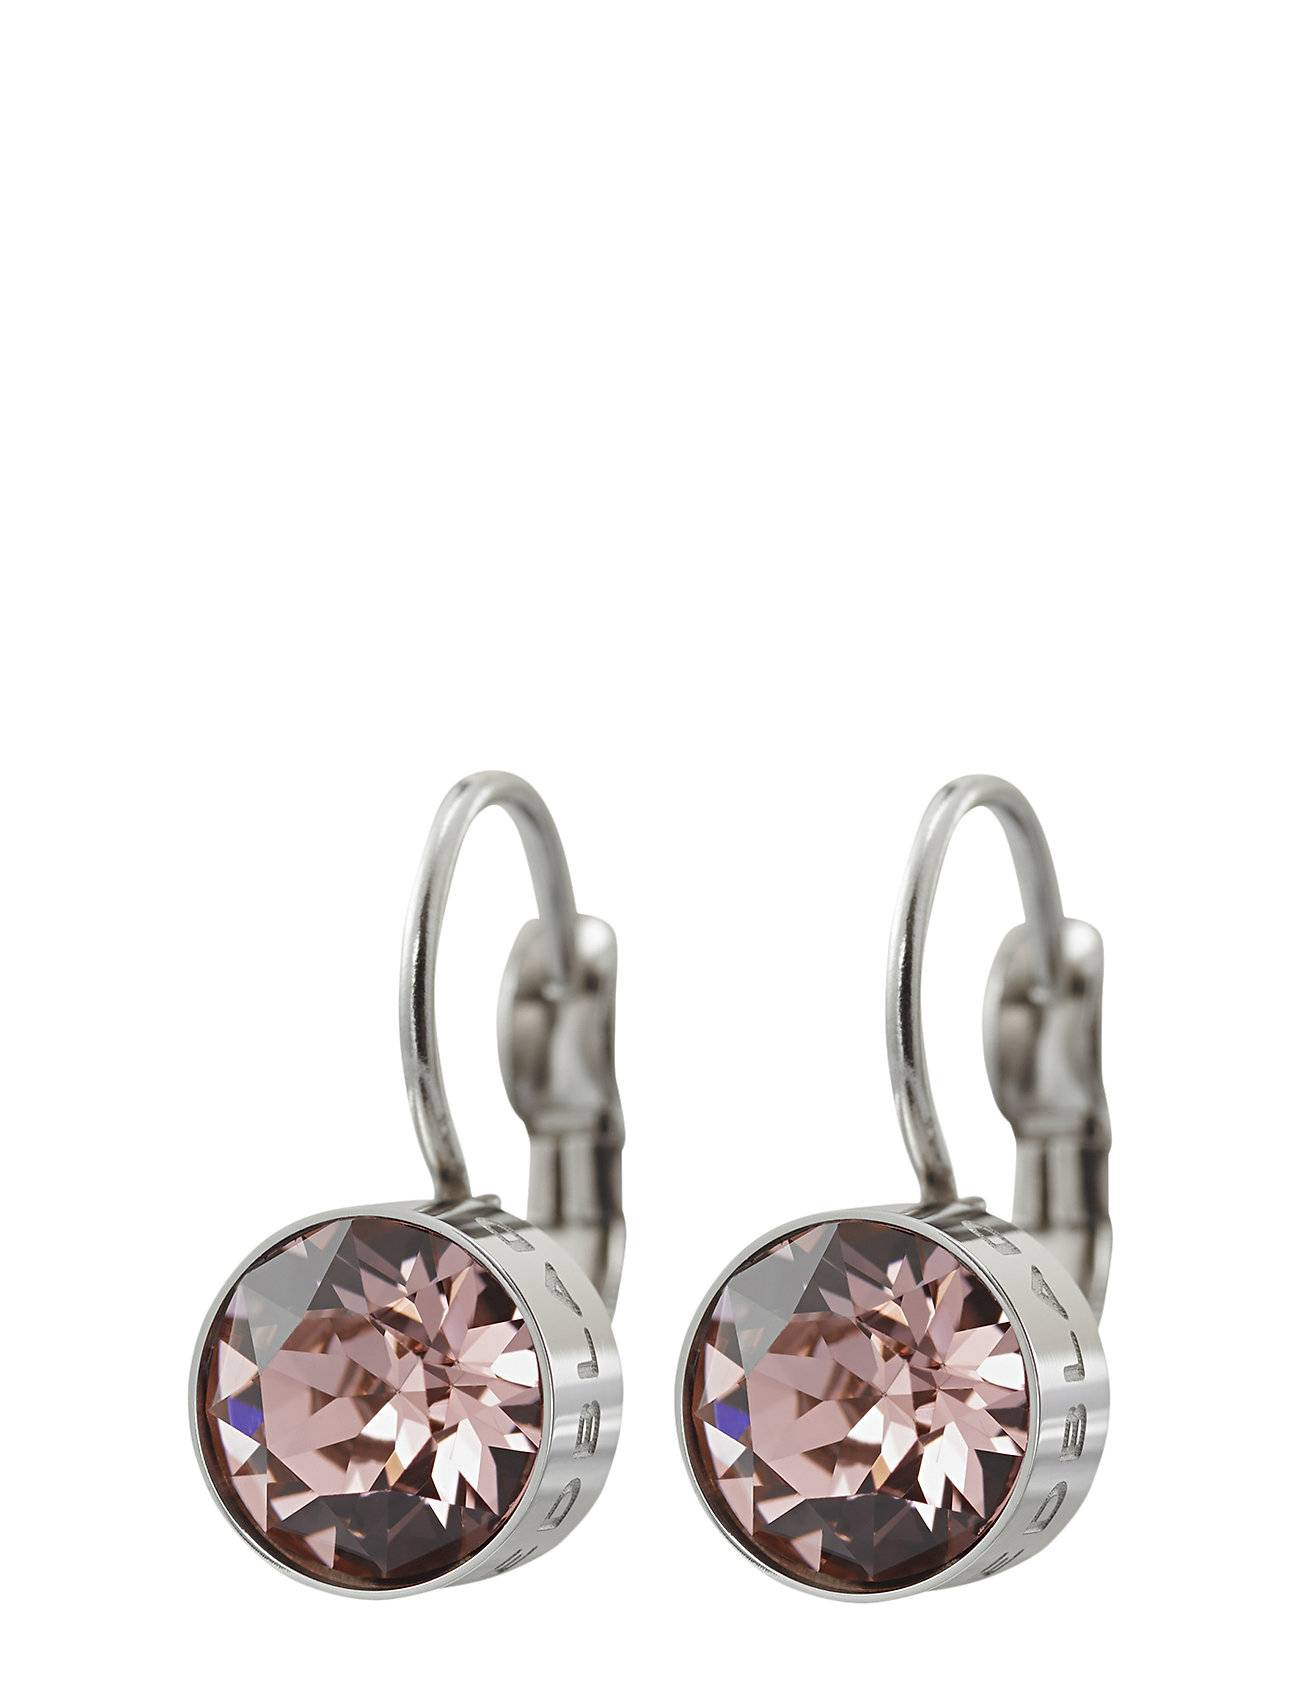 Edblad Diana Earrings Bubble Gum Crystal Steel Accessories Jewellery Earrings Hoops Hopea Edblad